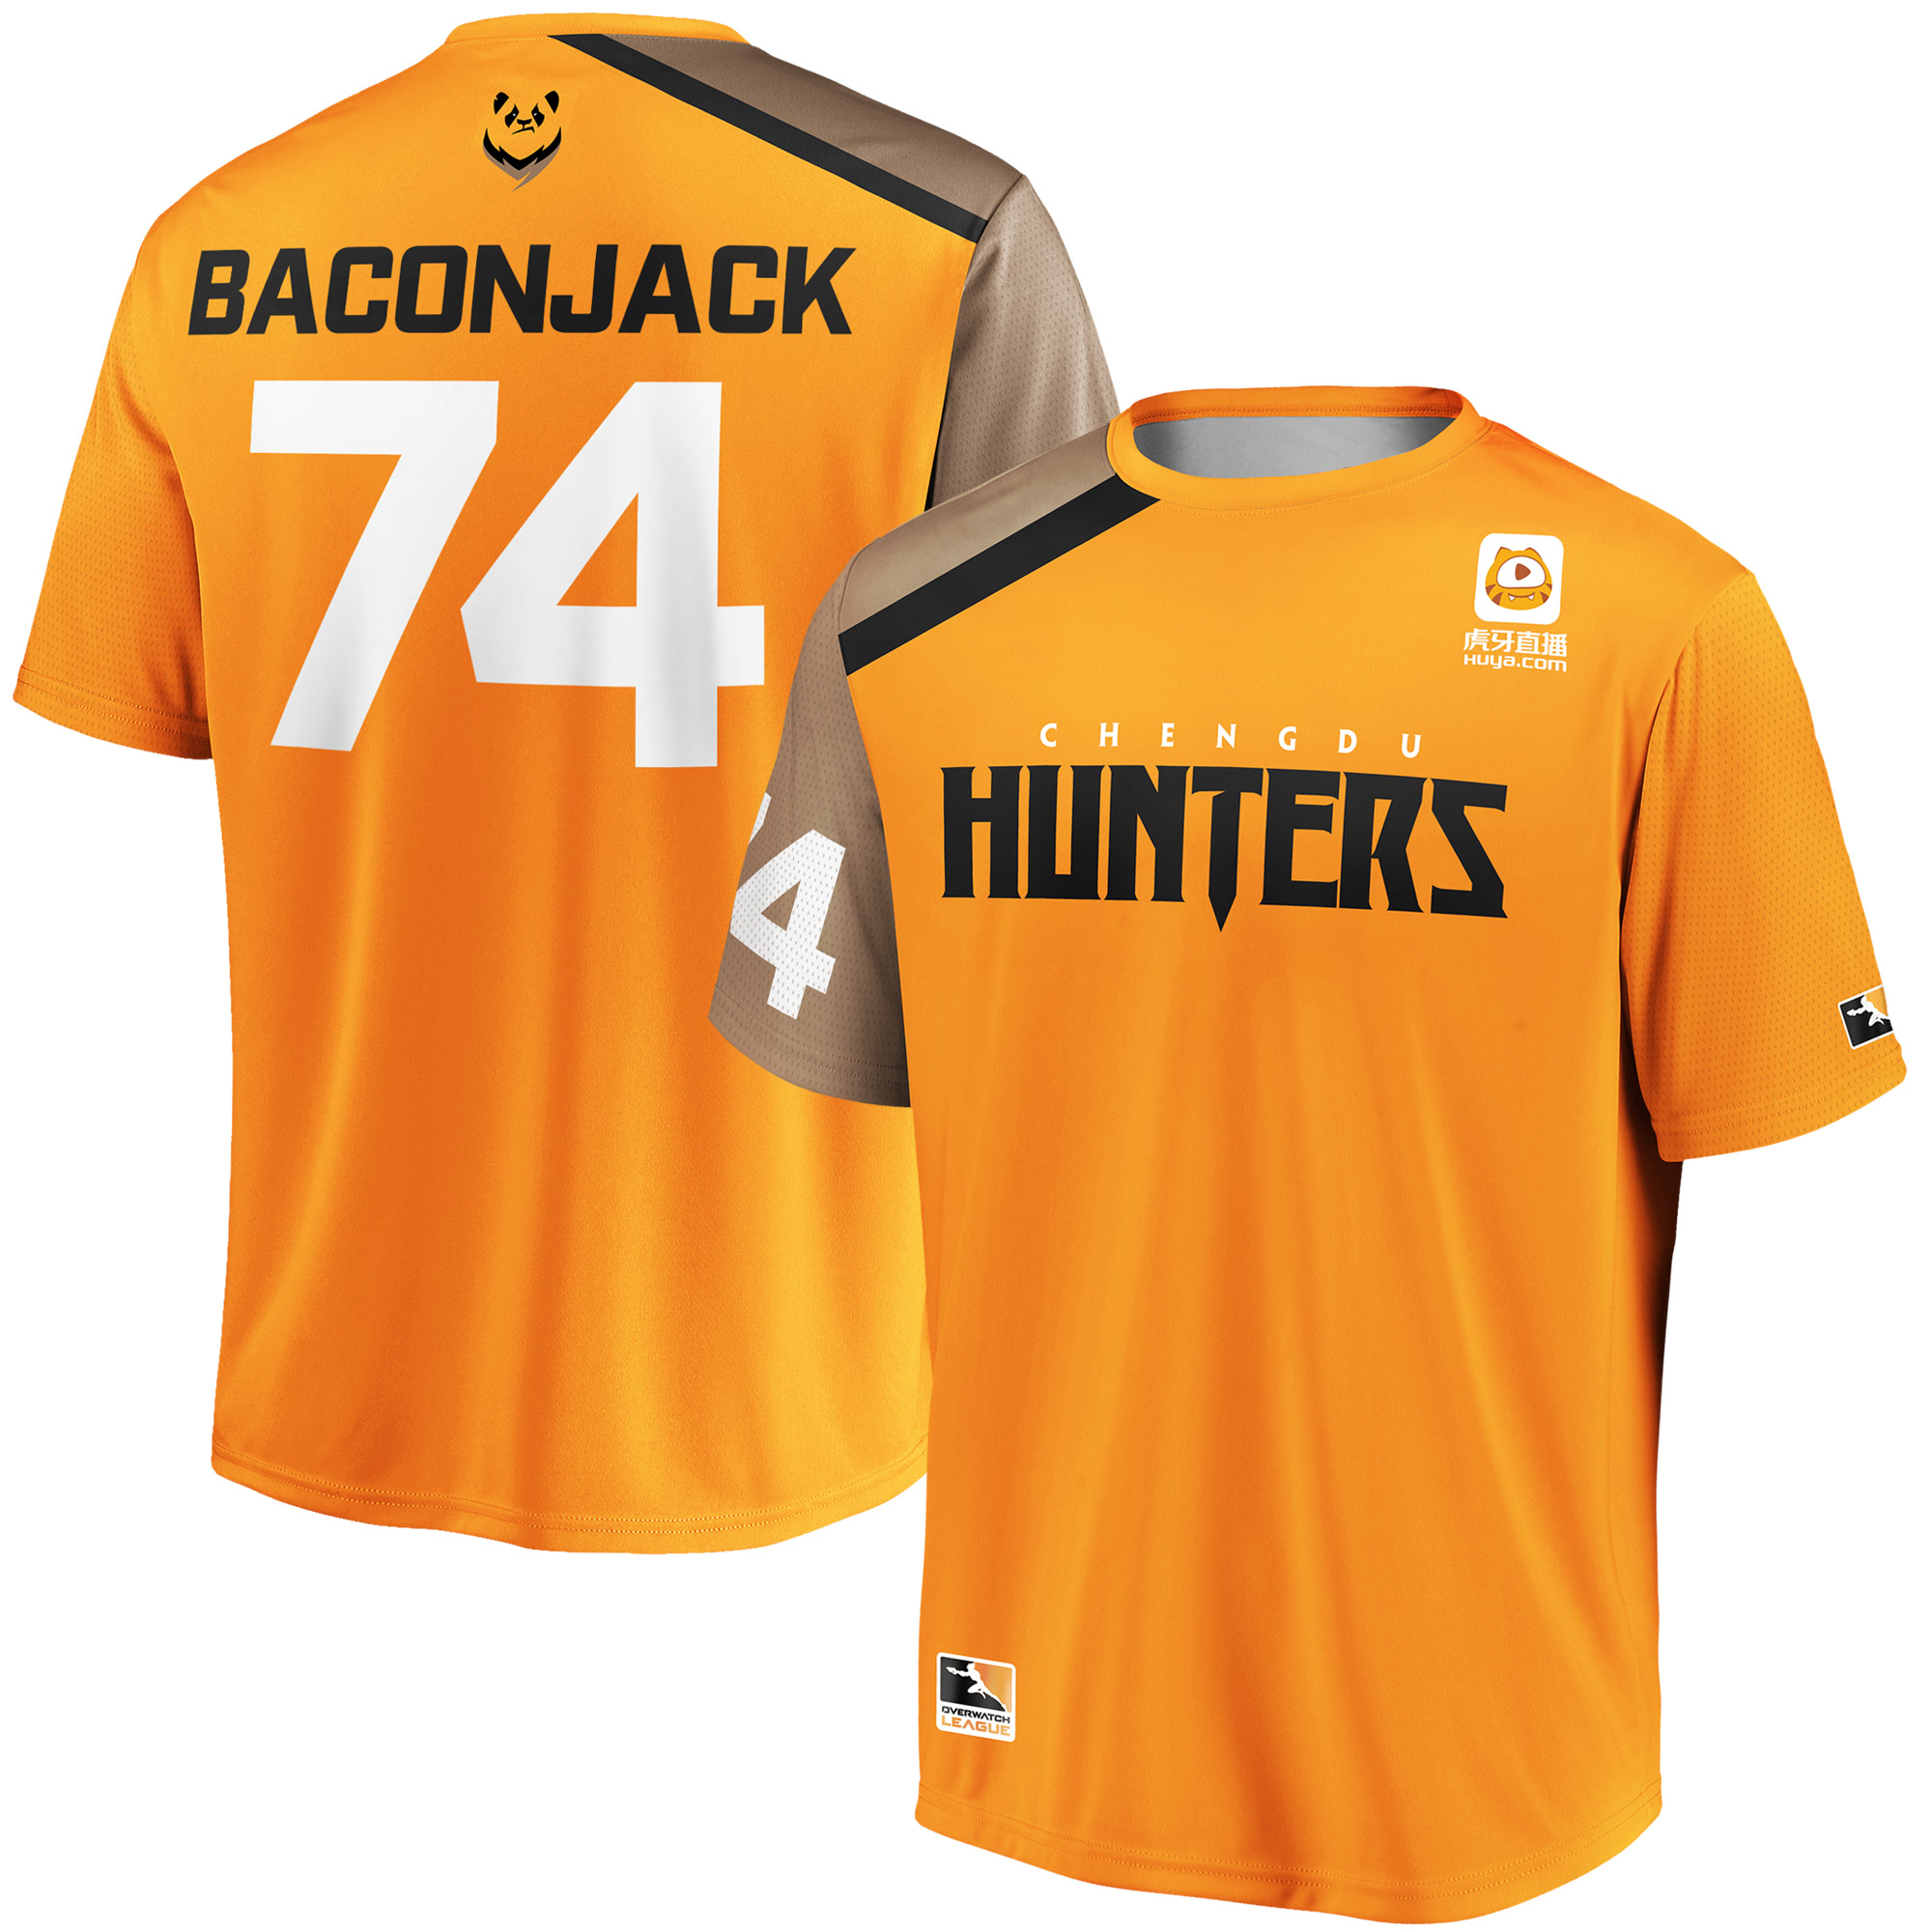 Baconjack Chengdu Hunters Overwatch League Replica Home Jersey - Orange